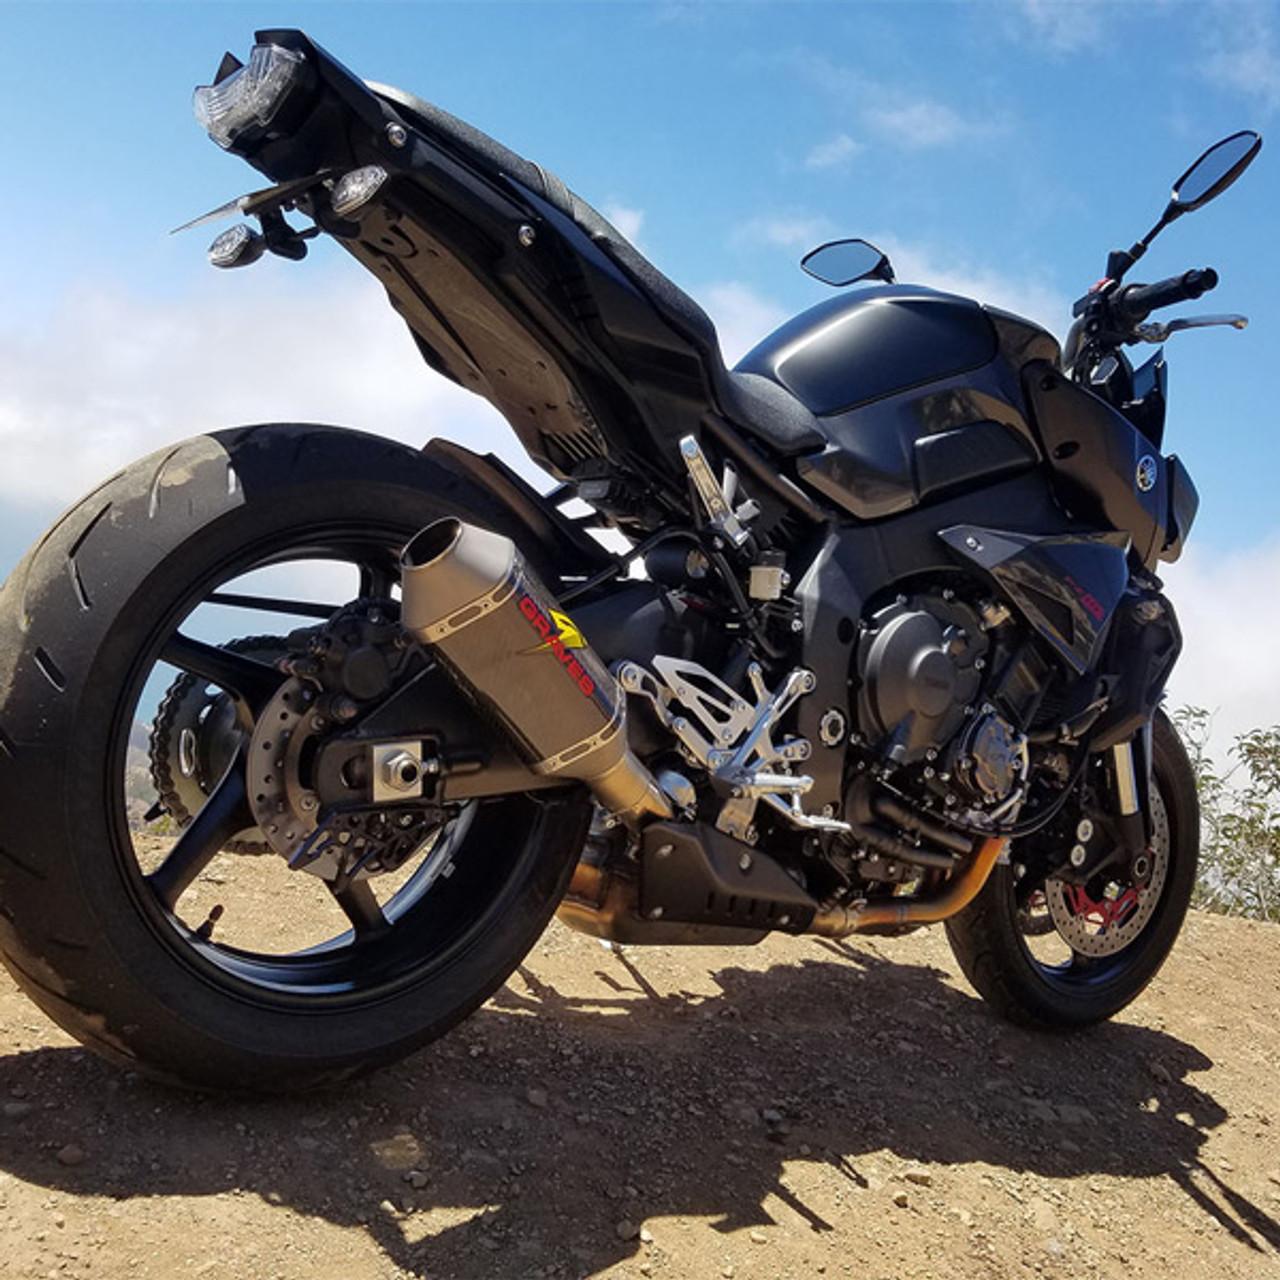 Graves Motorsports Yamaha FZ-10 / MT-10 17-18 Carbon Cat Back Slip-On  Exhaust